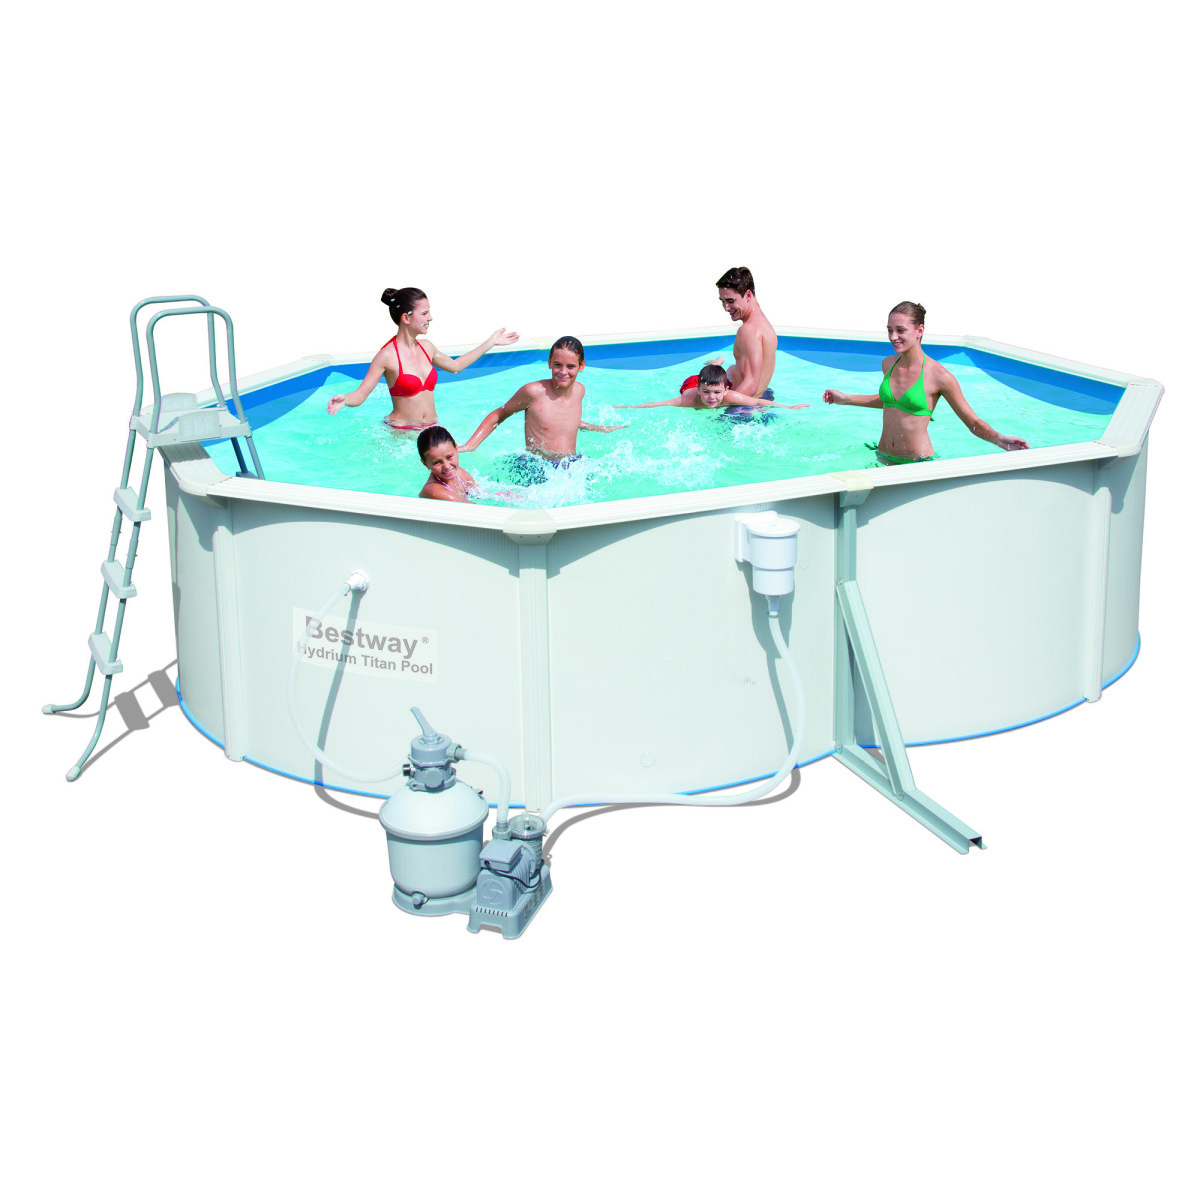 Сборный бассейн Bestway Hydrium Pool Titan 56586/56286 (488x366x122)